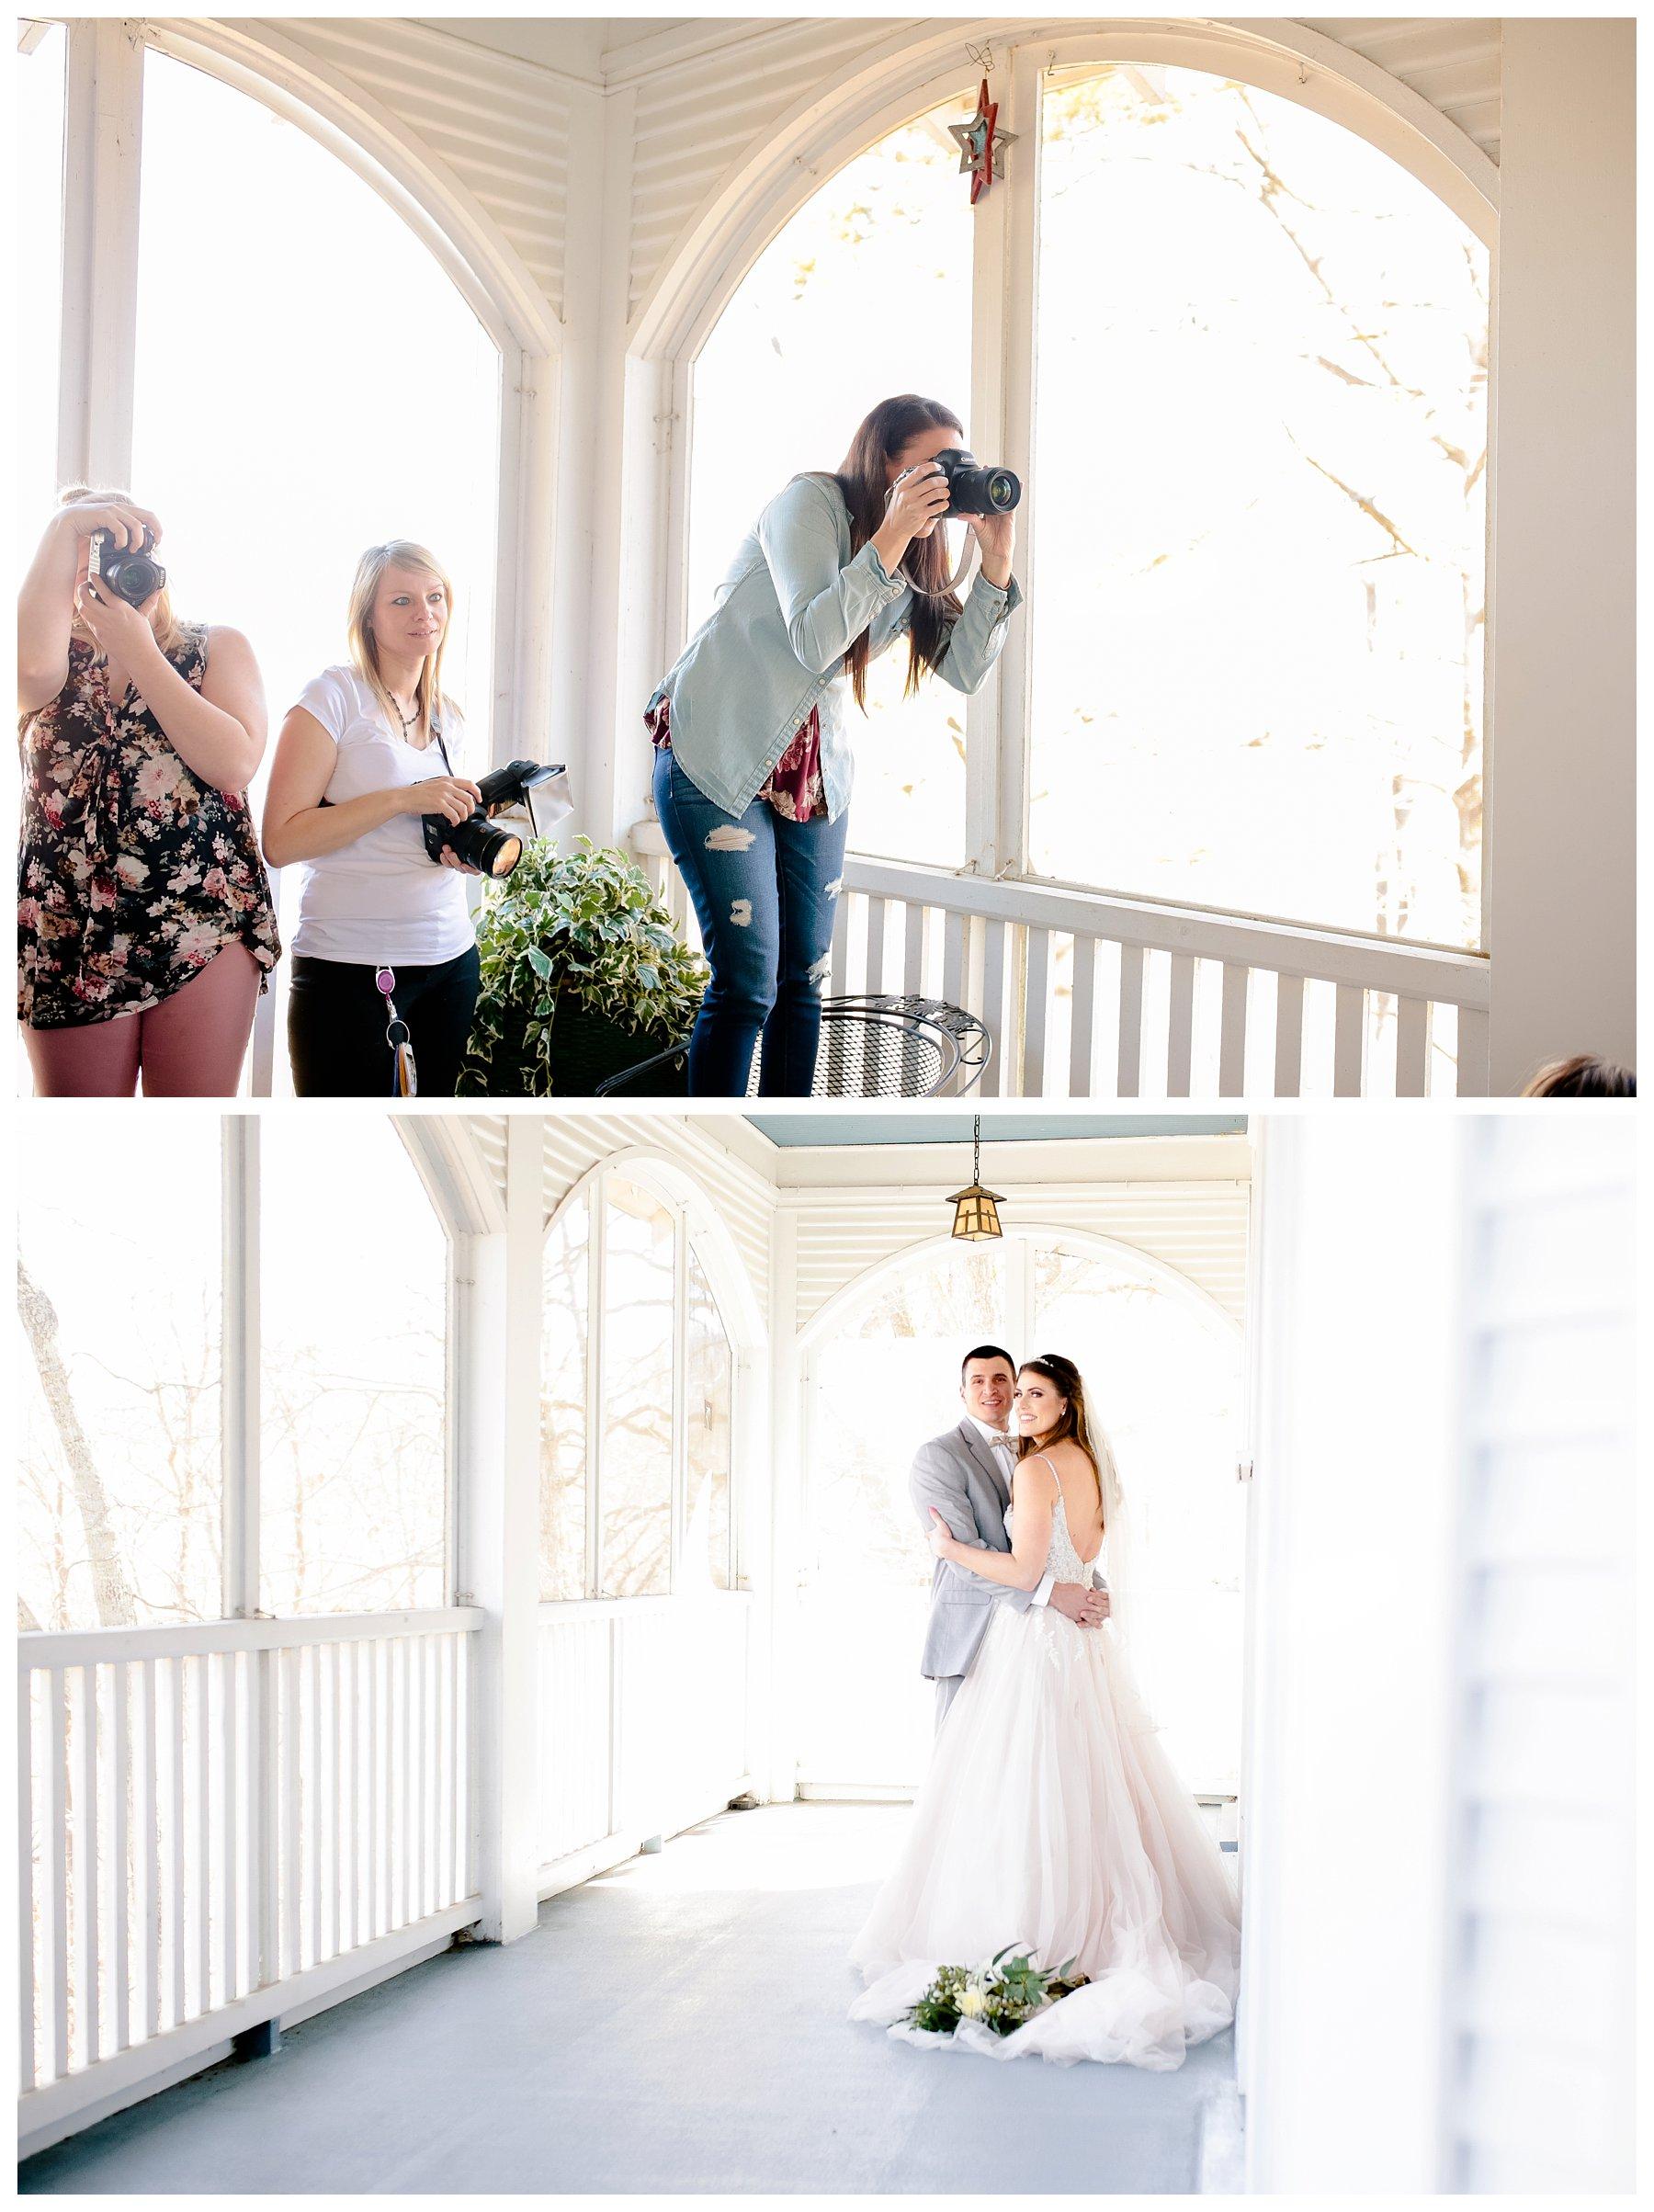 photographer_wedding_saint_louis_Kansas_City_Photography_Videography_workshop_training_styled_engagement_Lake_Ozark_KC_MO_STL_Rolla_Hermann_Saint_James_0365.jpg